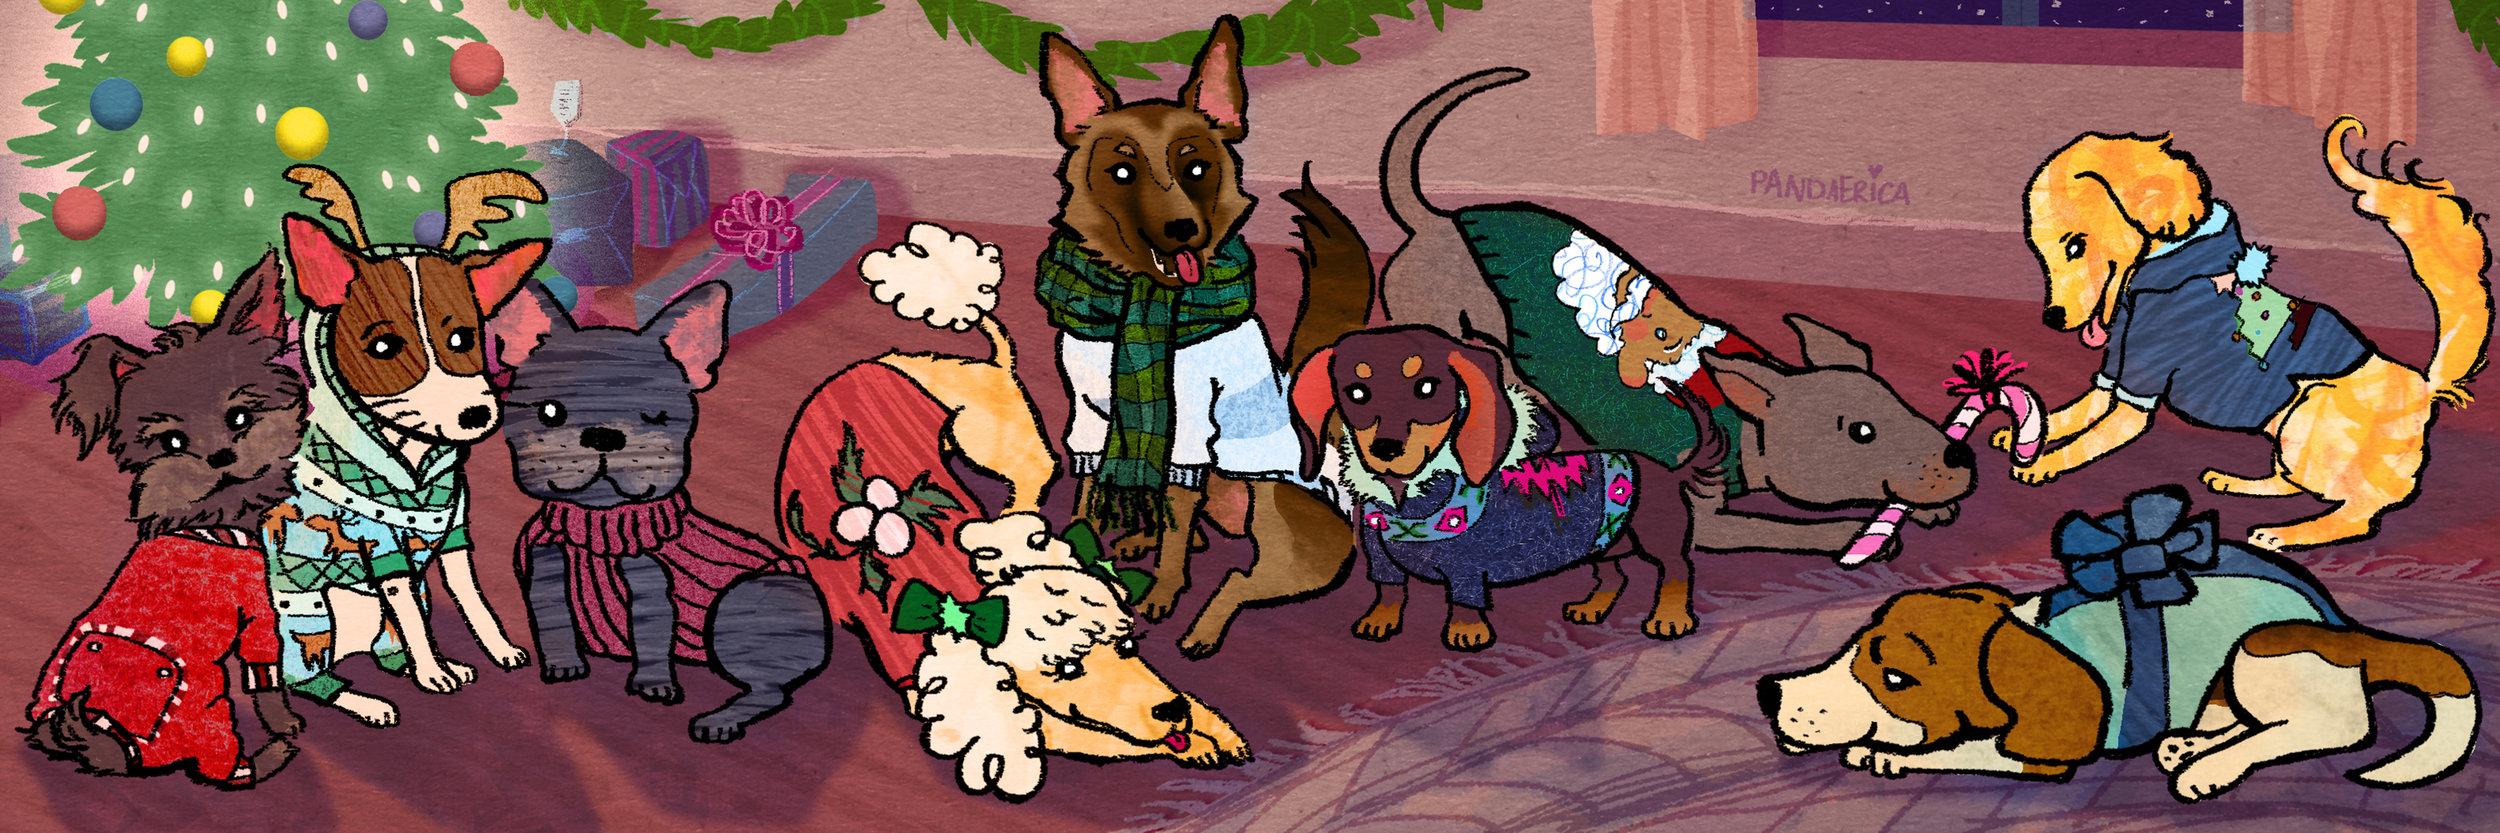 9 Dogs Wearing Sweaters